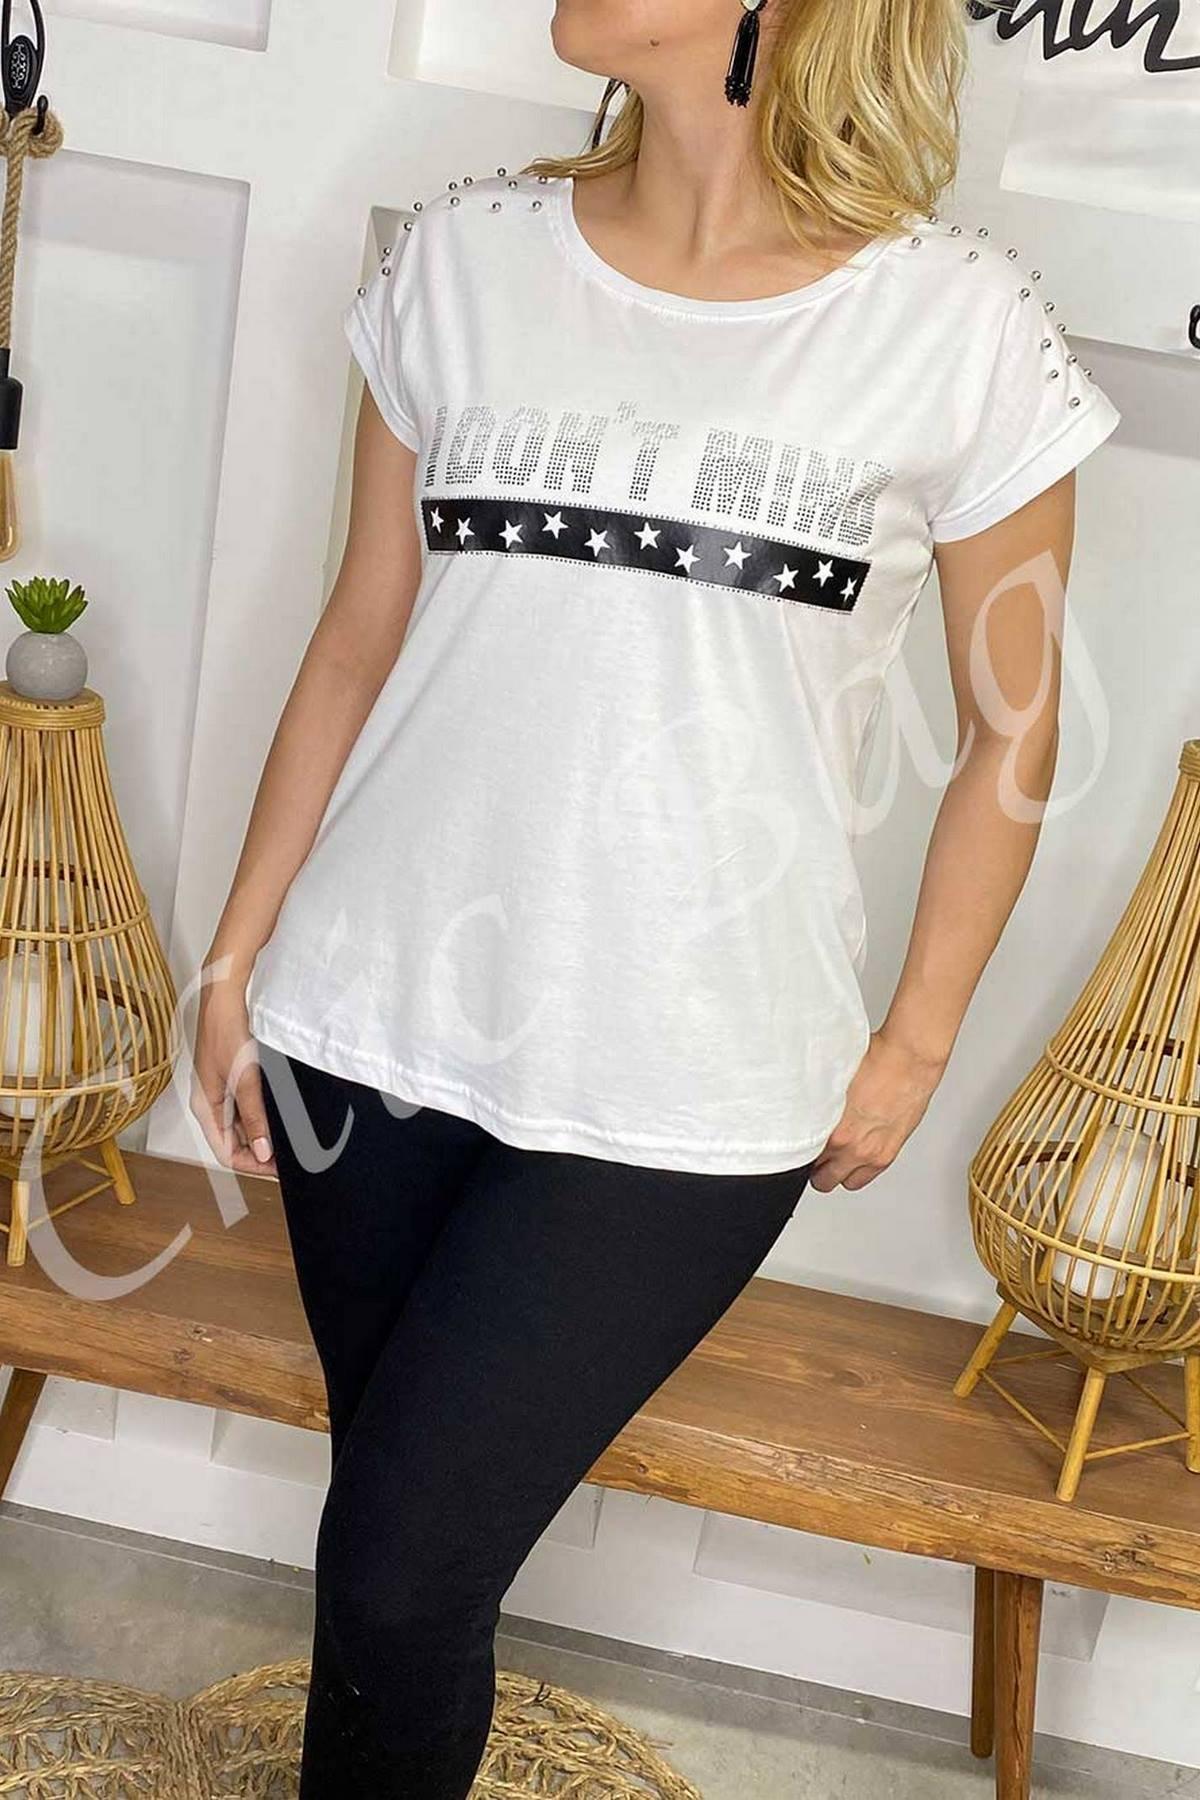 https://resim.chicbag.com.tr/p000955/byz/i-dont-mind-baski-t-shirt-swns-01df4f8b51aa.